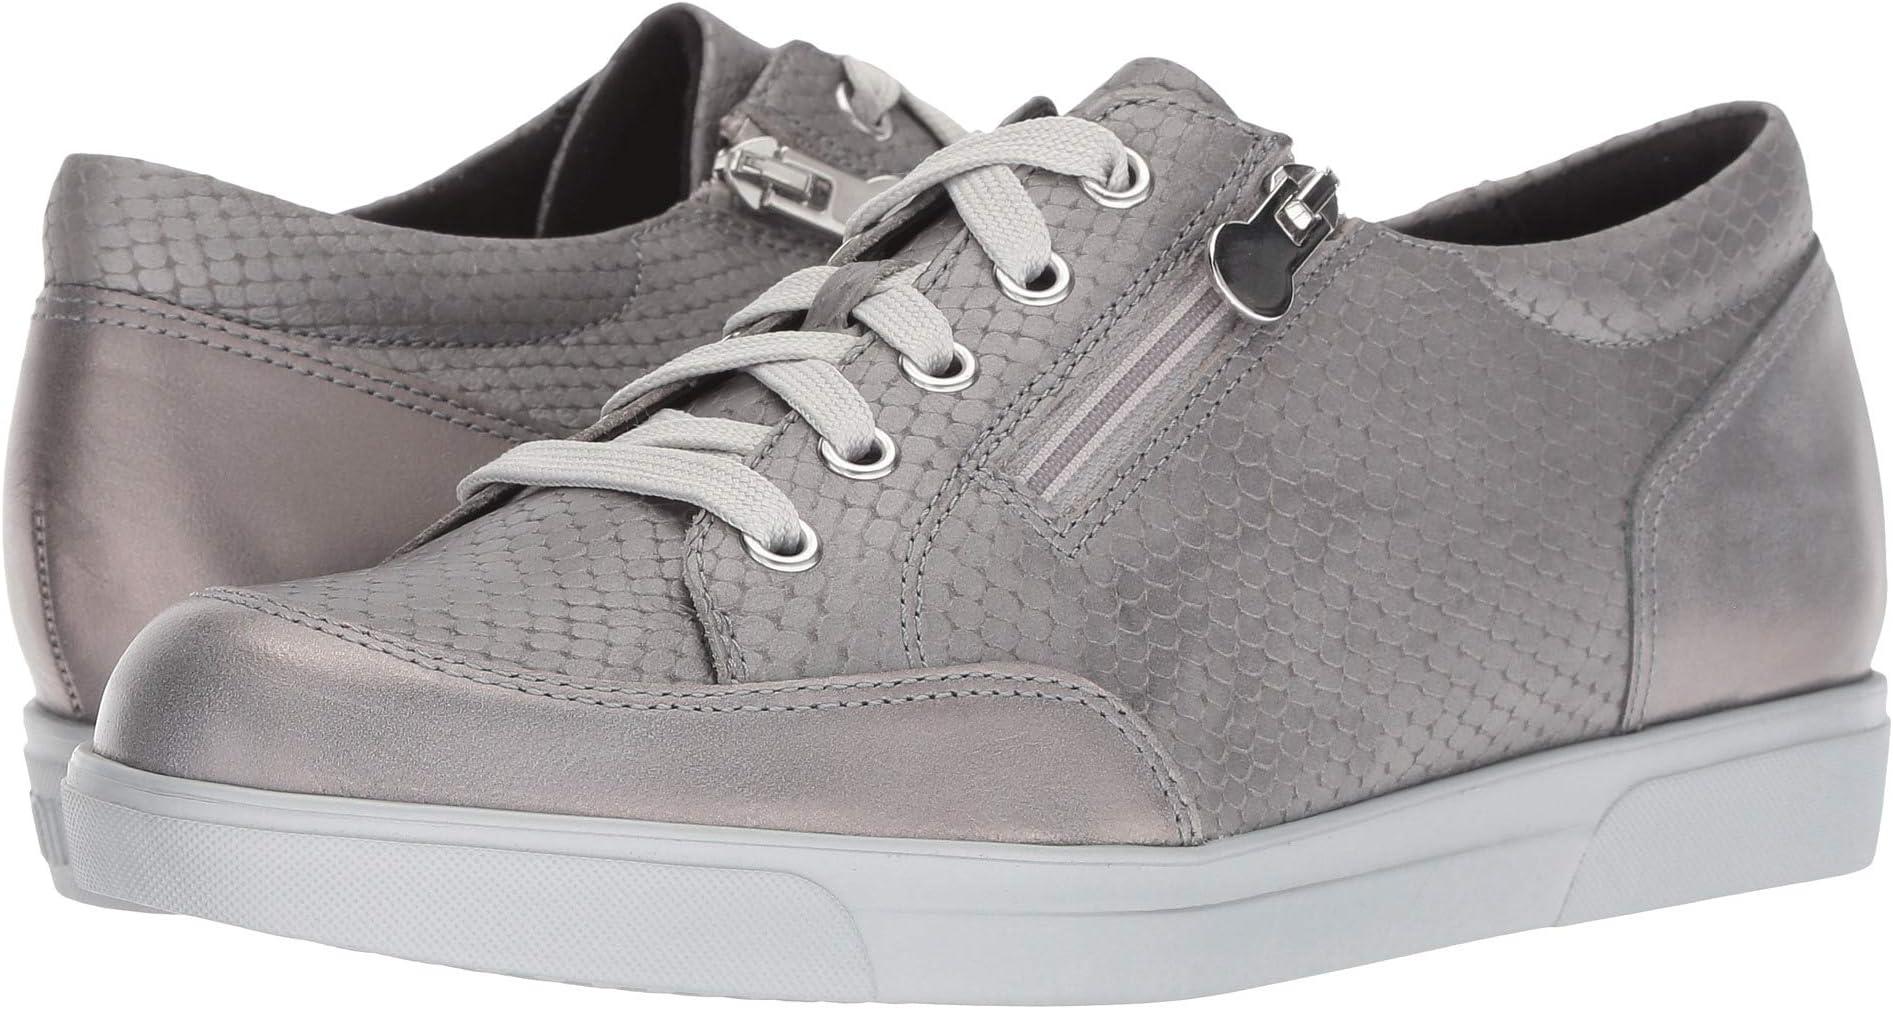 TC-5-Sneakers-2019-04-8